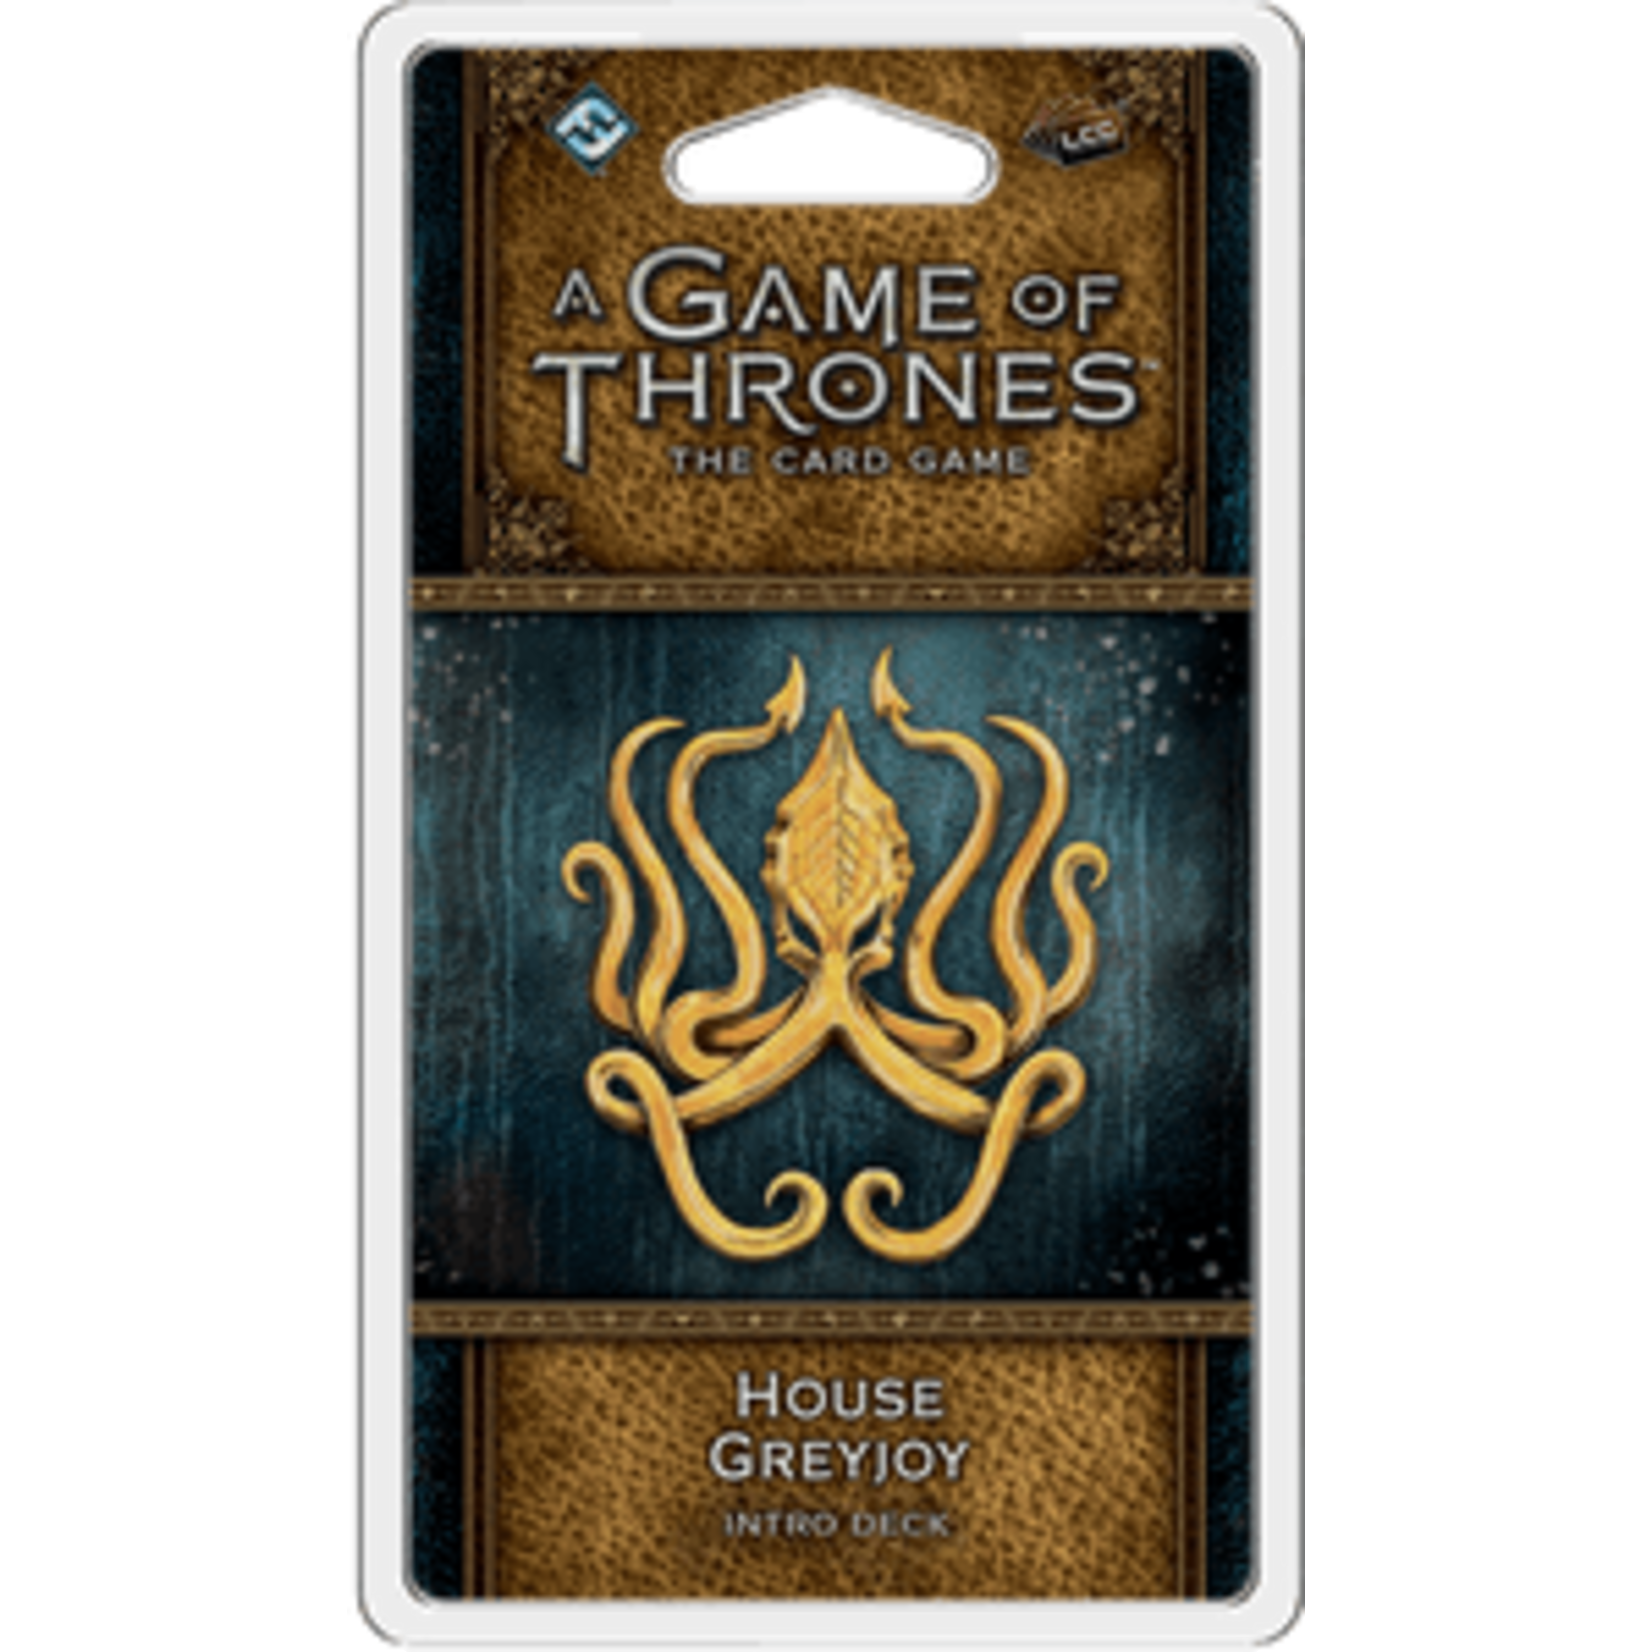 Game of Thrones LCG House Greyjoy Intro Deck